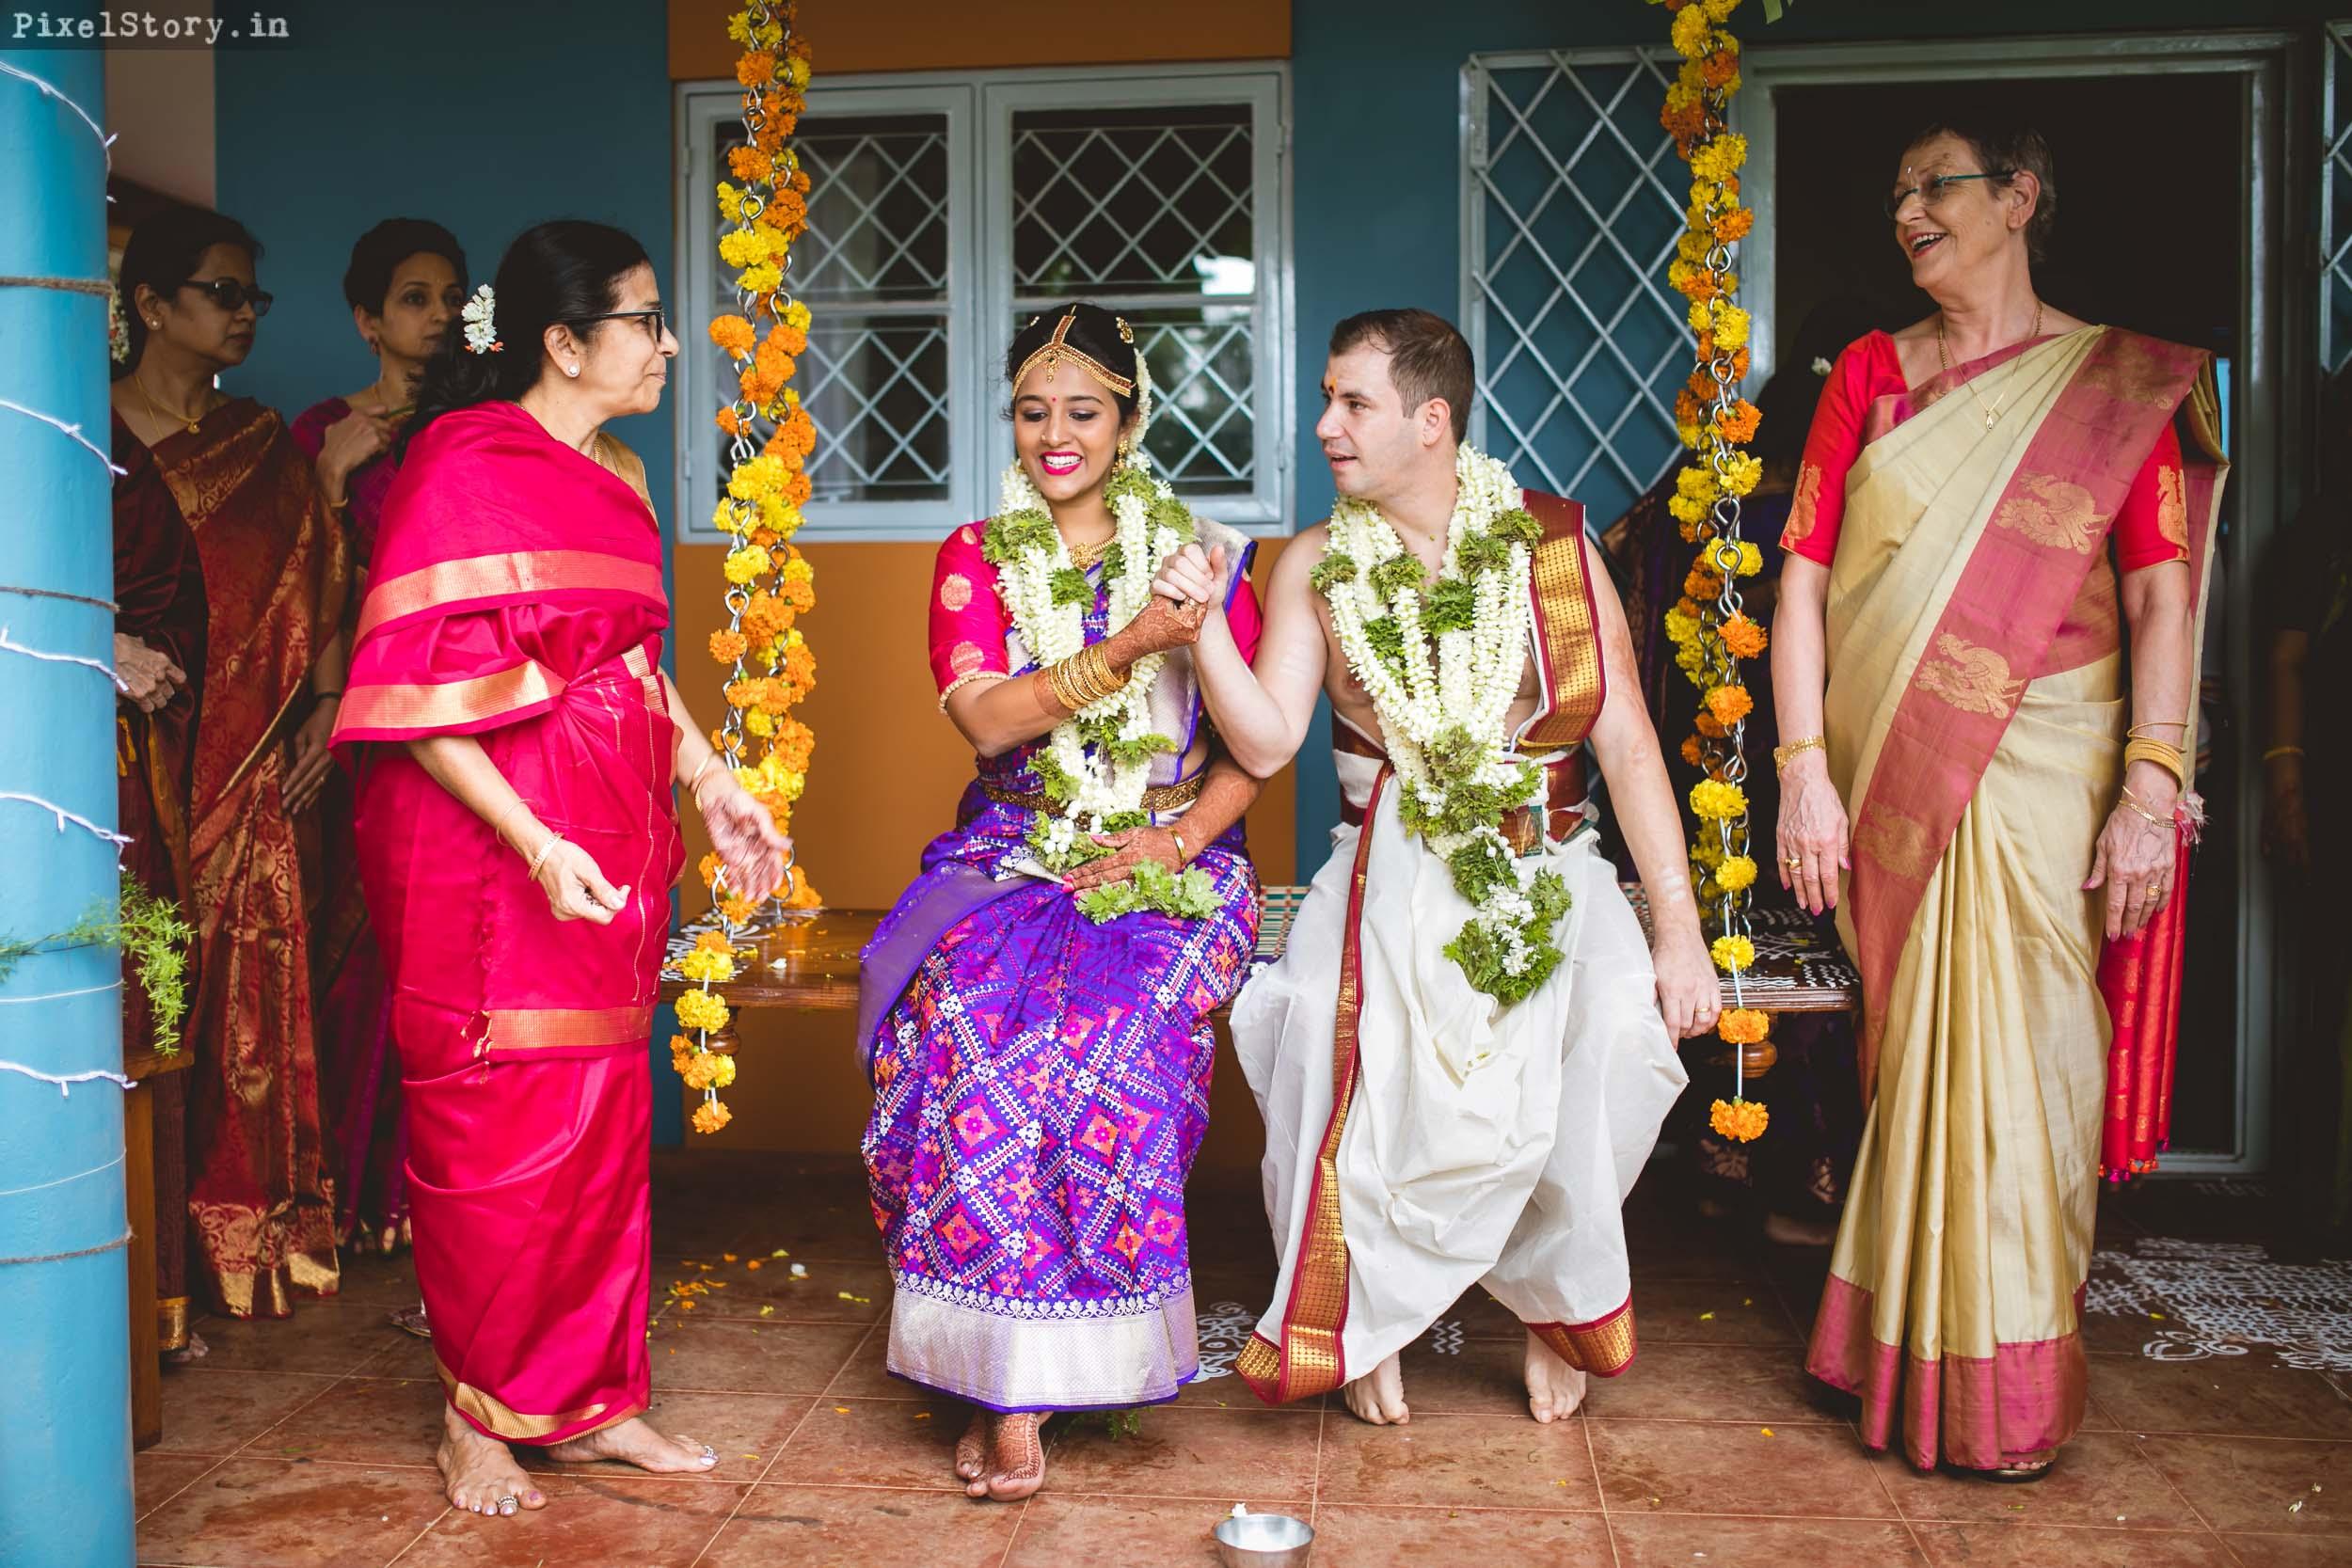 PixelStory-Jungle-Wedding-Photographer-Masinagudi-Indo-French034.jpg